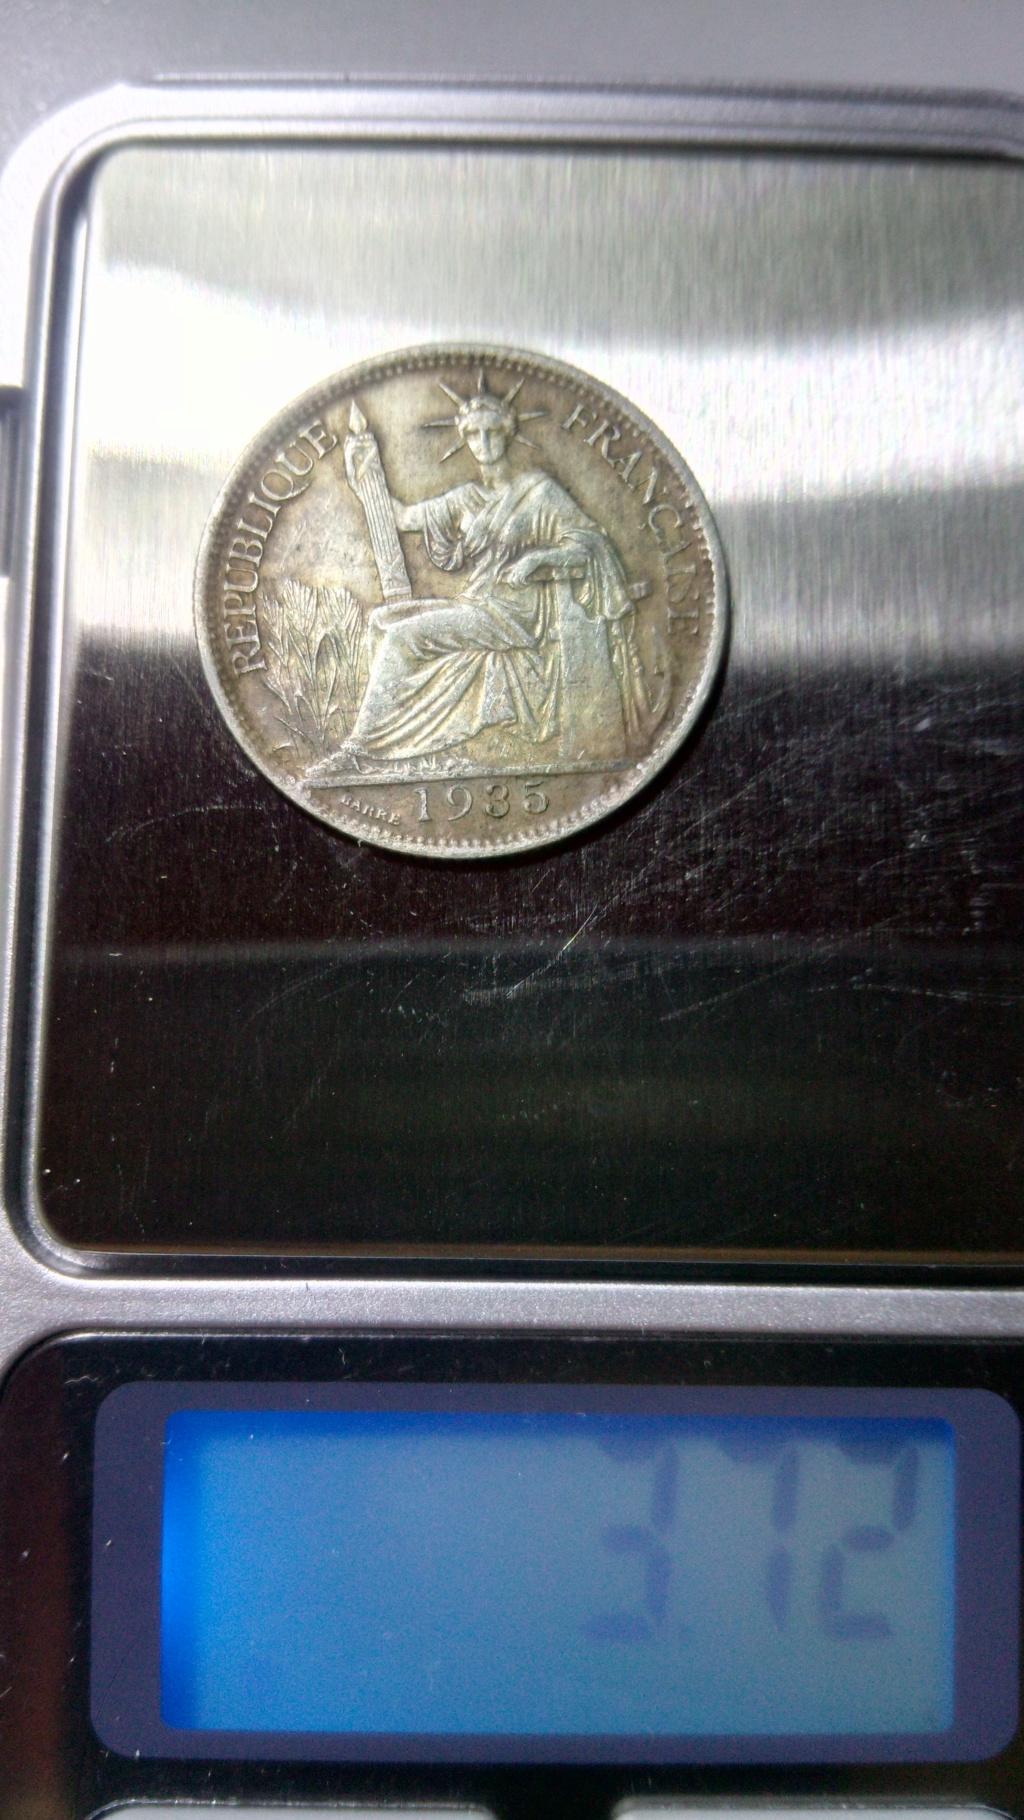 20 céntimos 1935 Indochina Francesa Img_2011